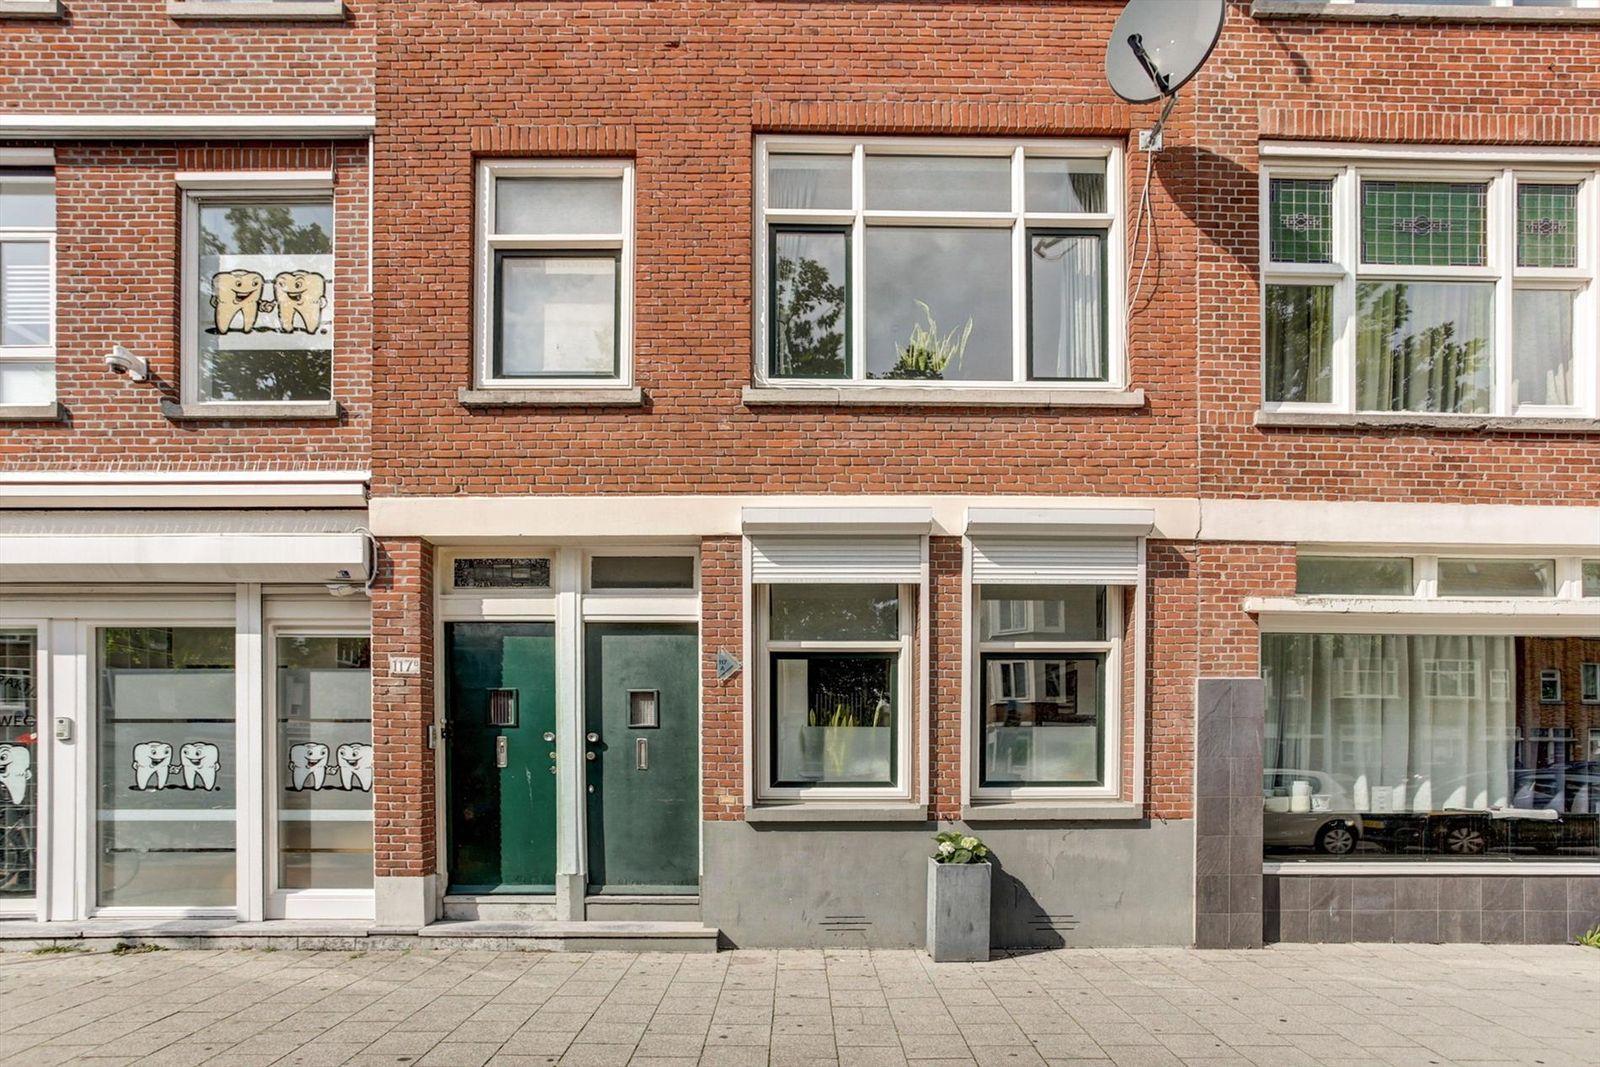 Strevelsweg 117a, Rotterdam